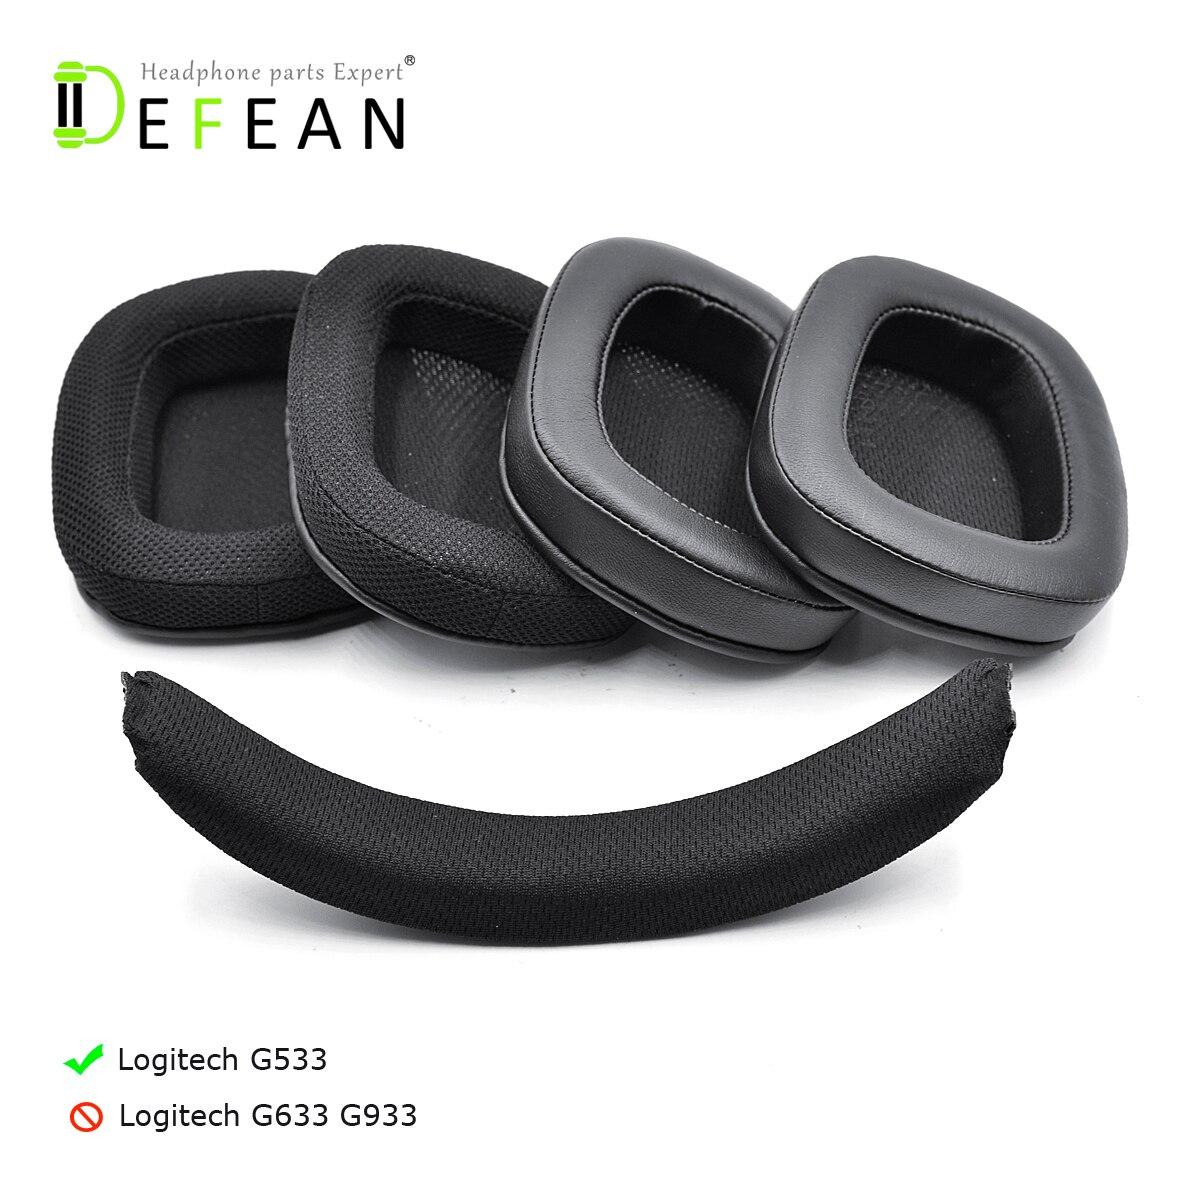 Almohadillas para la cabeza Defean G533 G 533 para auriculares Logitech G533 G 533 Artemis (no para Logitech G933 G633)